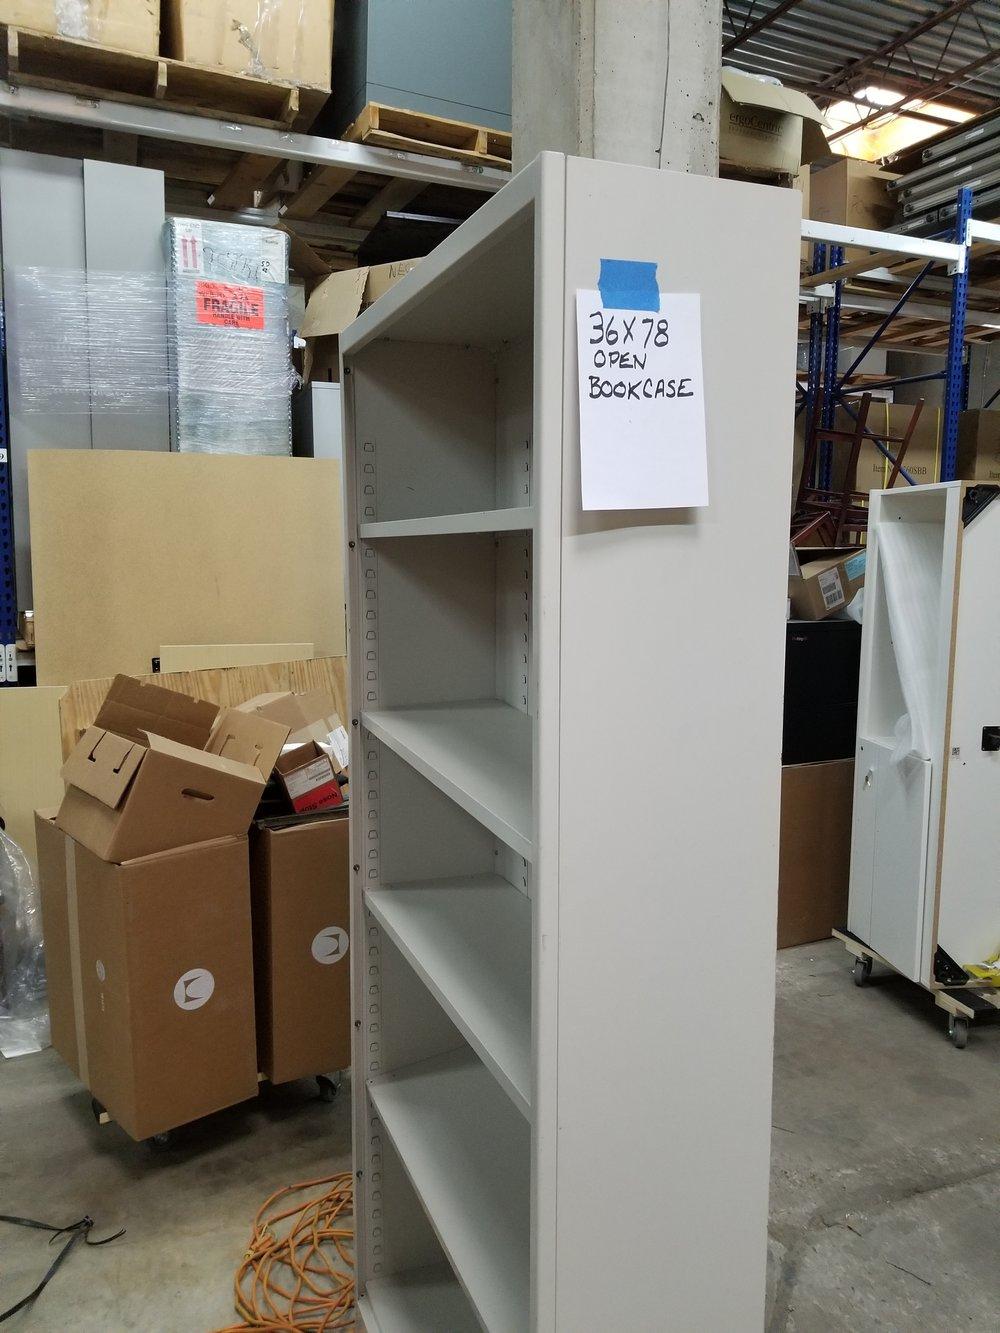 "36"" x 78"" Bookcase 5 shelves"